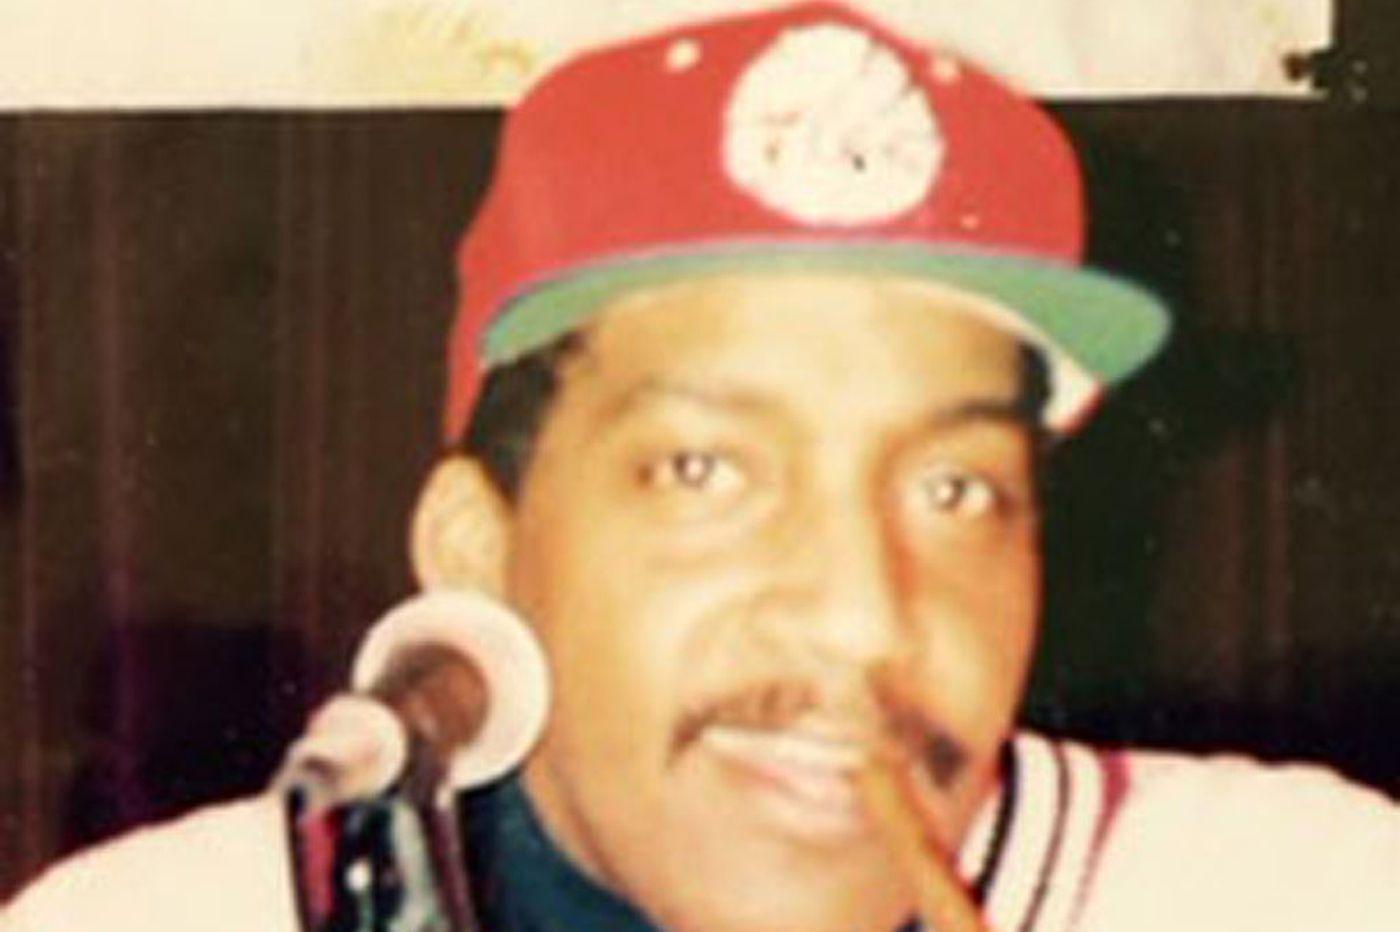 Beemon James Johnson III, 63, popular Philly disc jockey